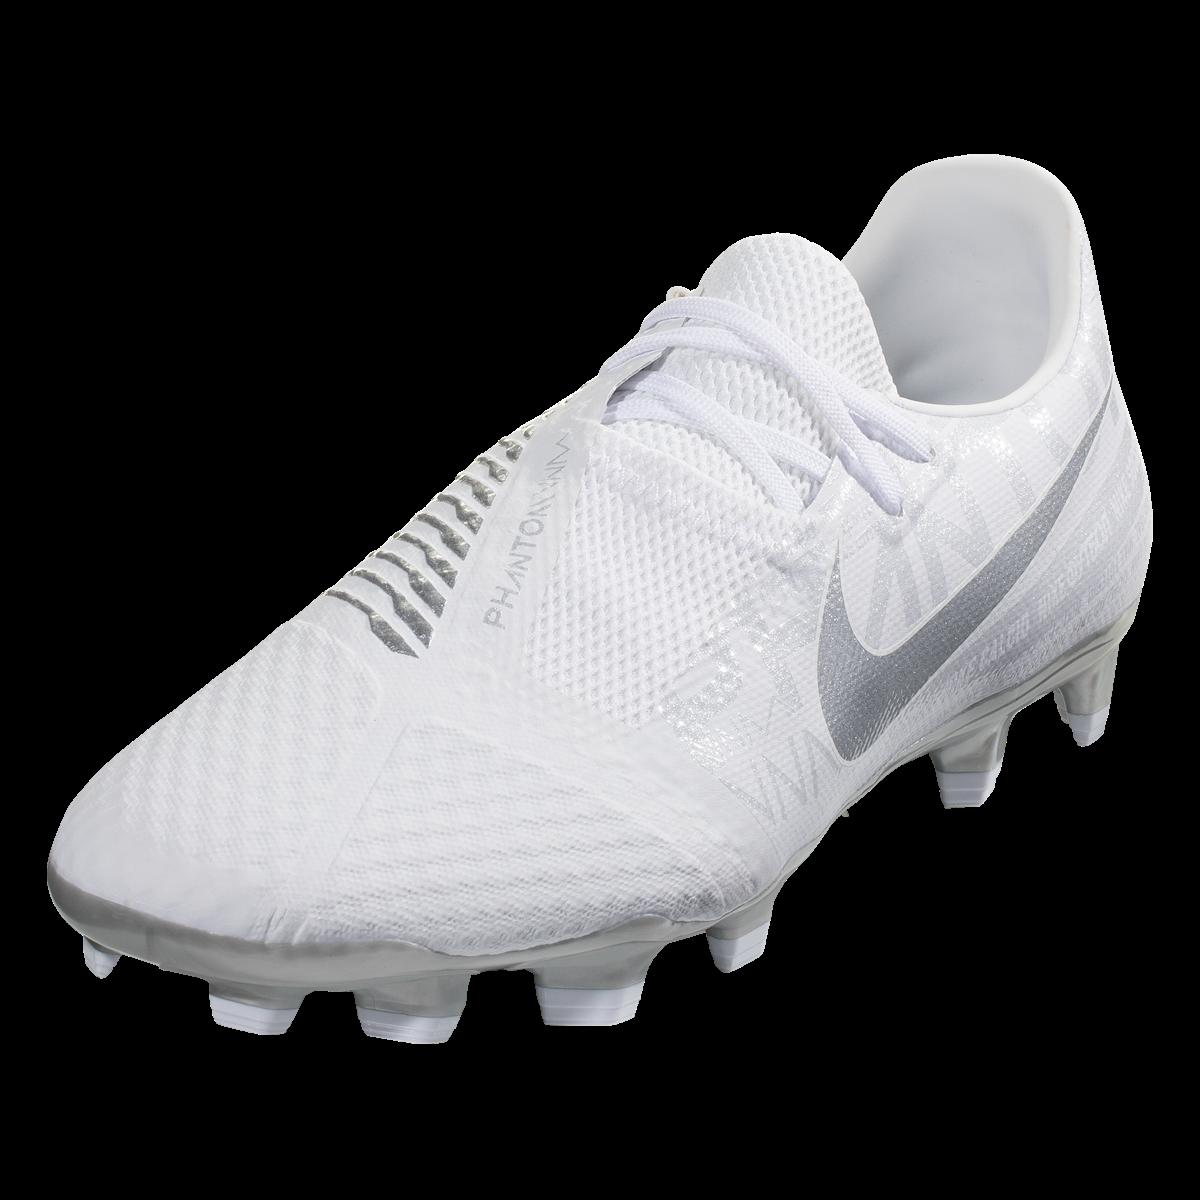 Nike Phantom Venom Academy Fg Firm Ground Soccer Shoe White Metallic Platinum 11 5 Soccer Shoe Soccer Nike Cleats